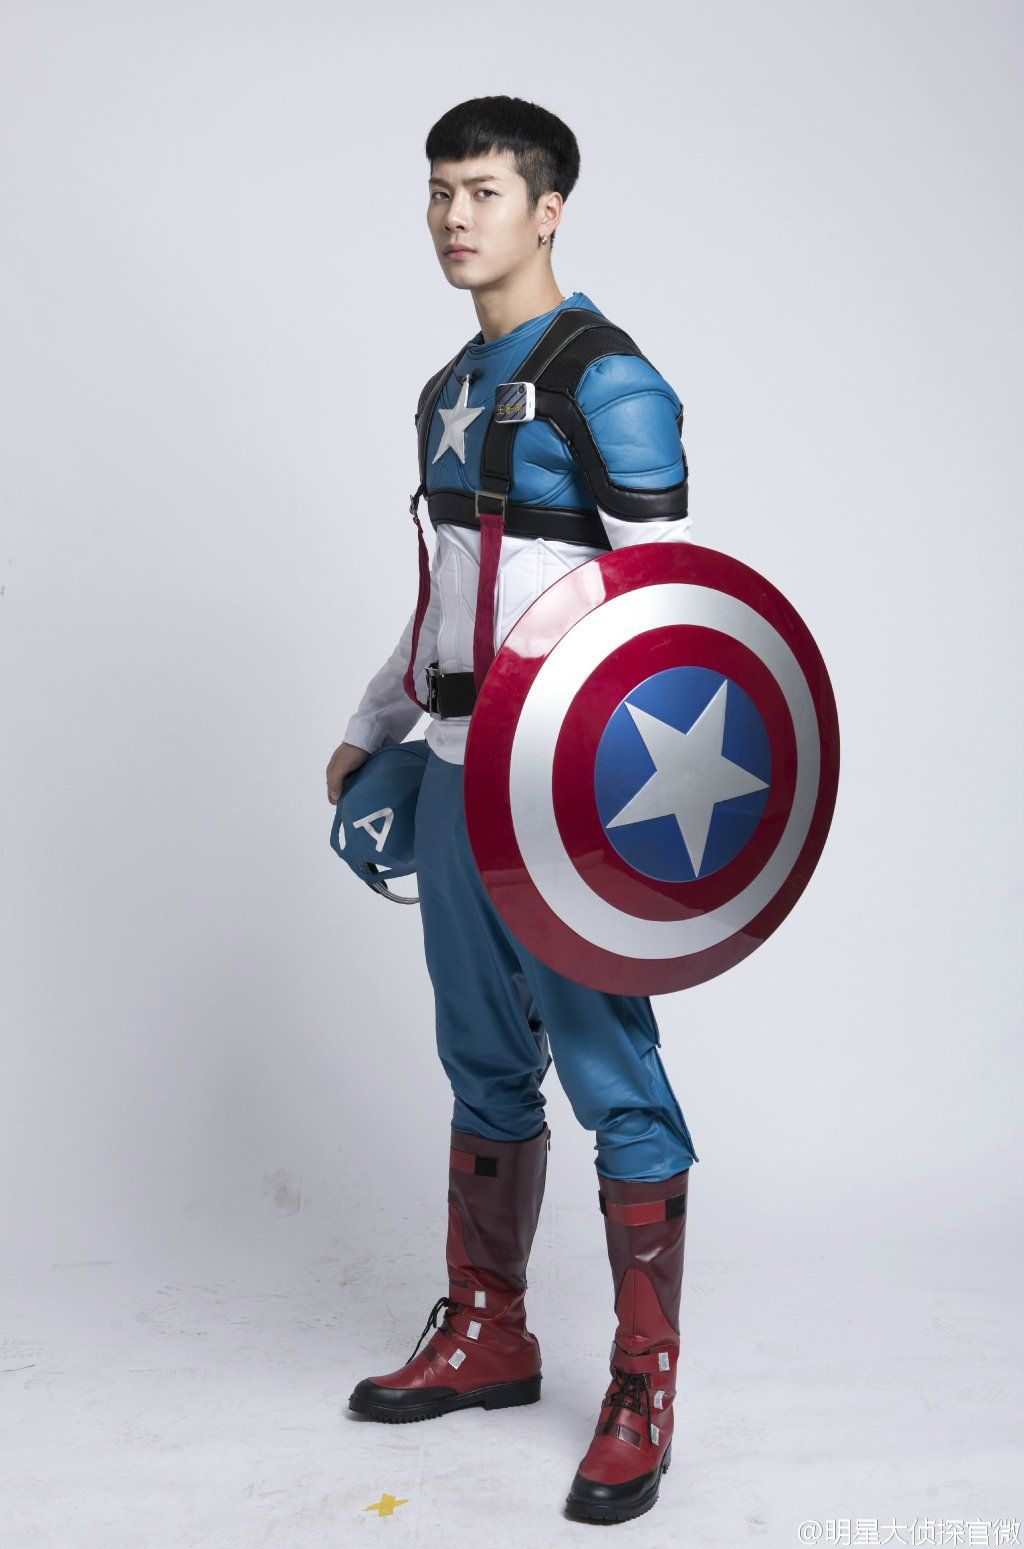 Got 7 Jackson dressed up as Captain America